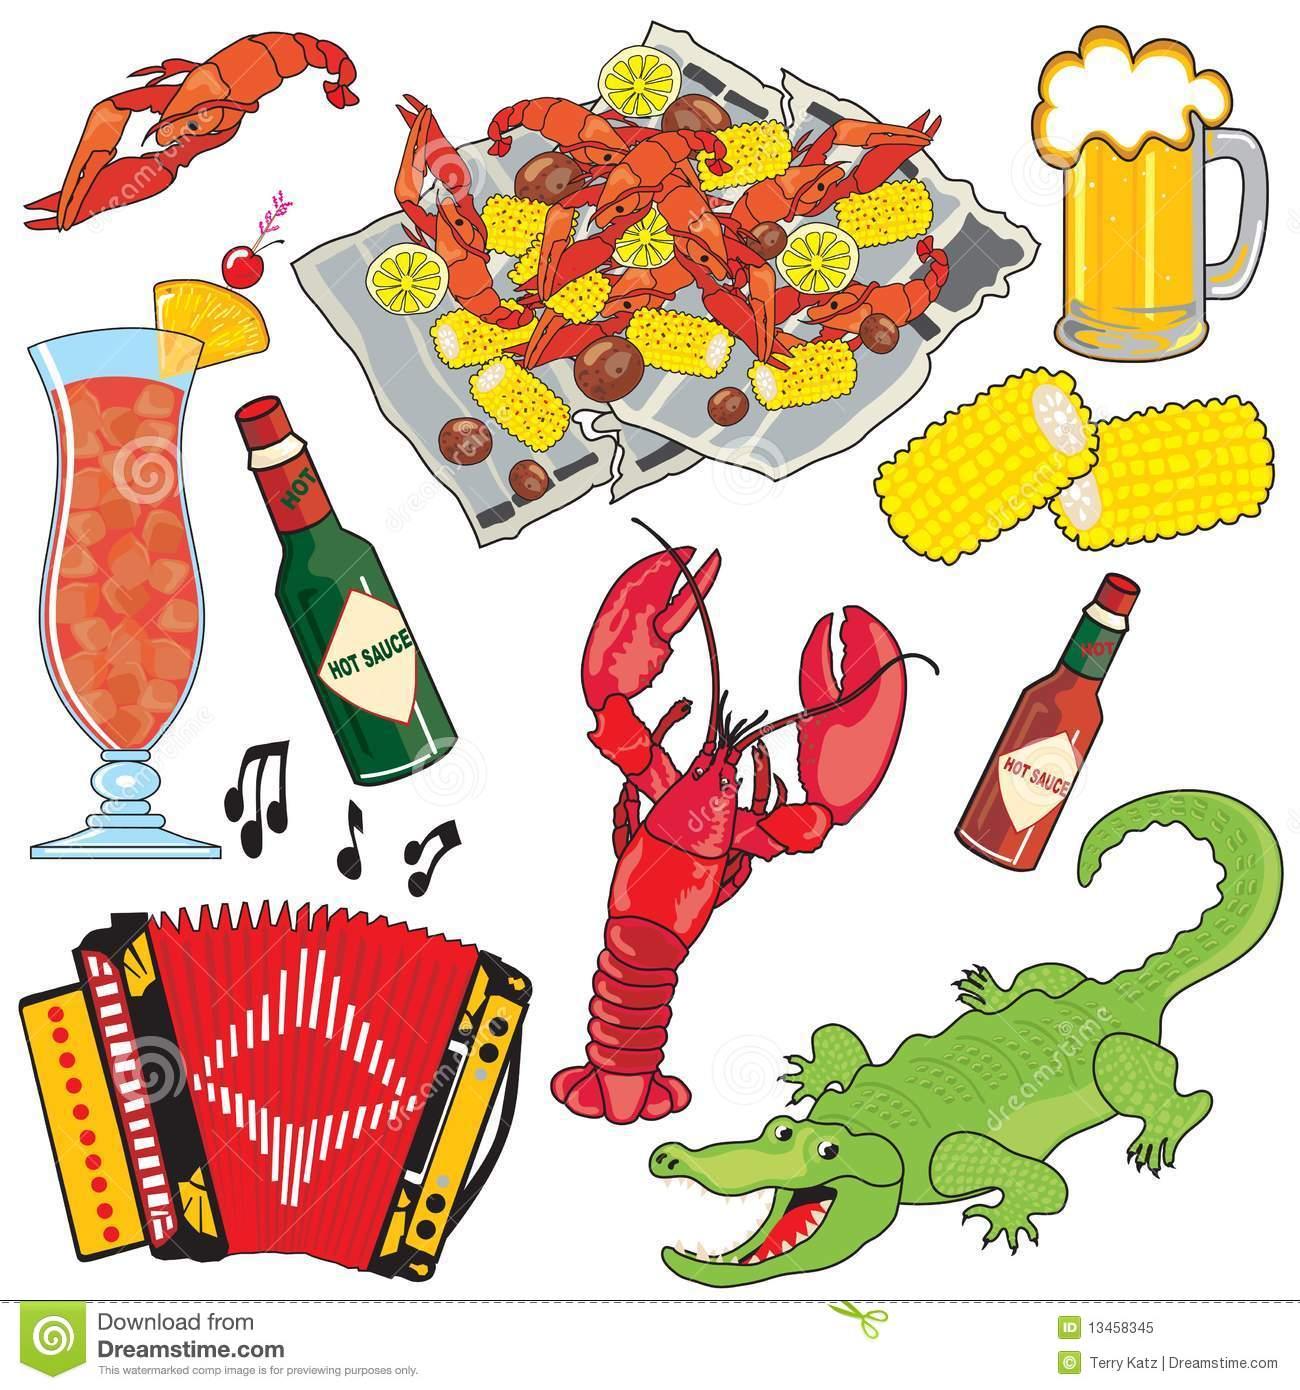 Cajun Food, Music And Drinks Clipart Ico-Cajun Food, Music and drinks clipart icons and ele-9